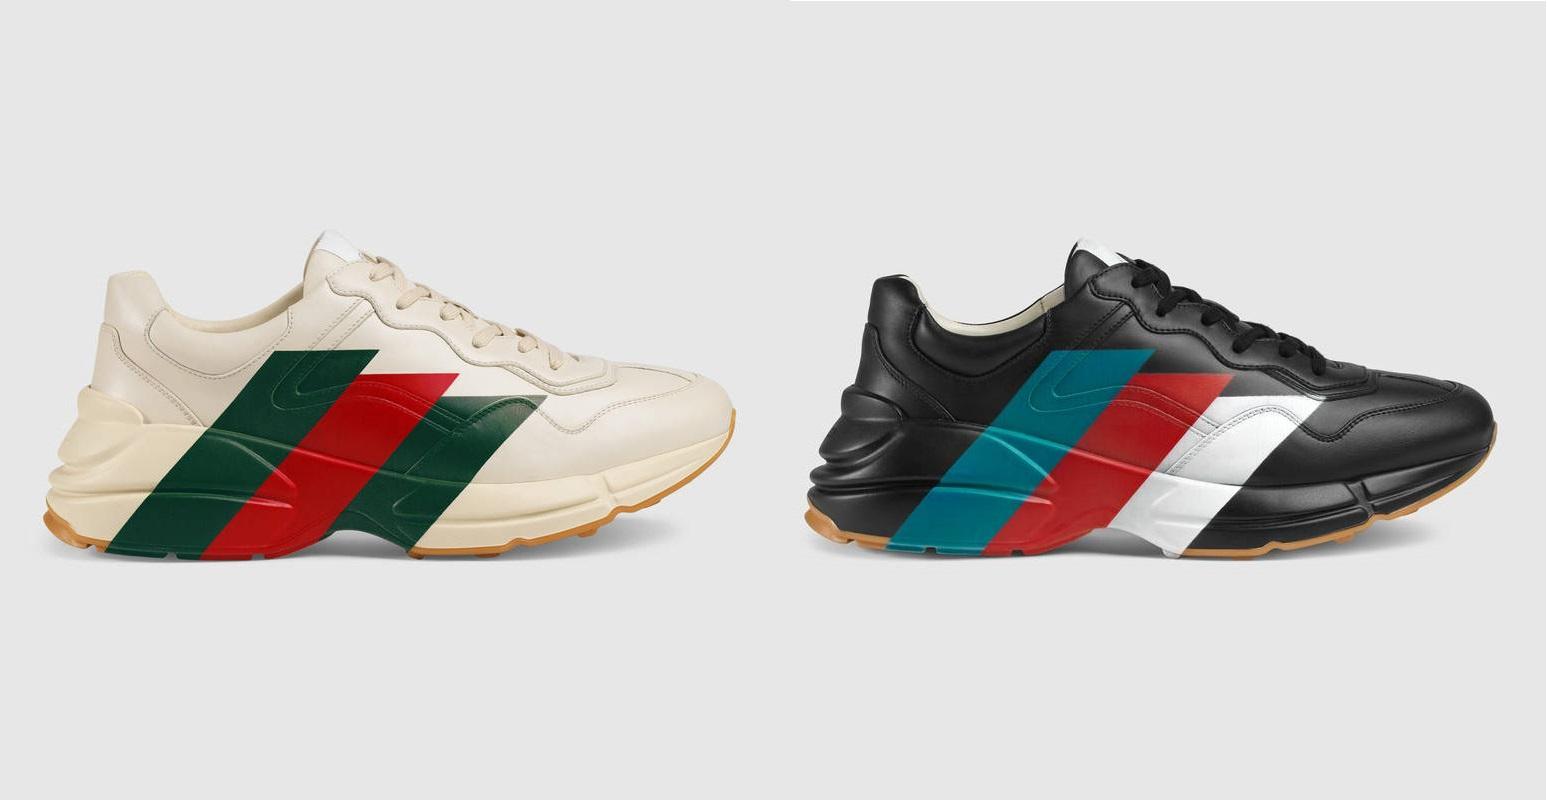 Gucci Drops New Athletic 'Rhyton' Sneaker